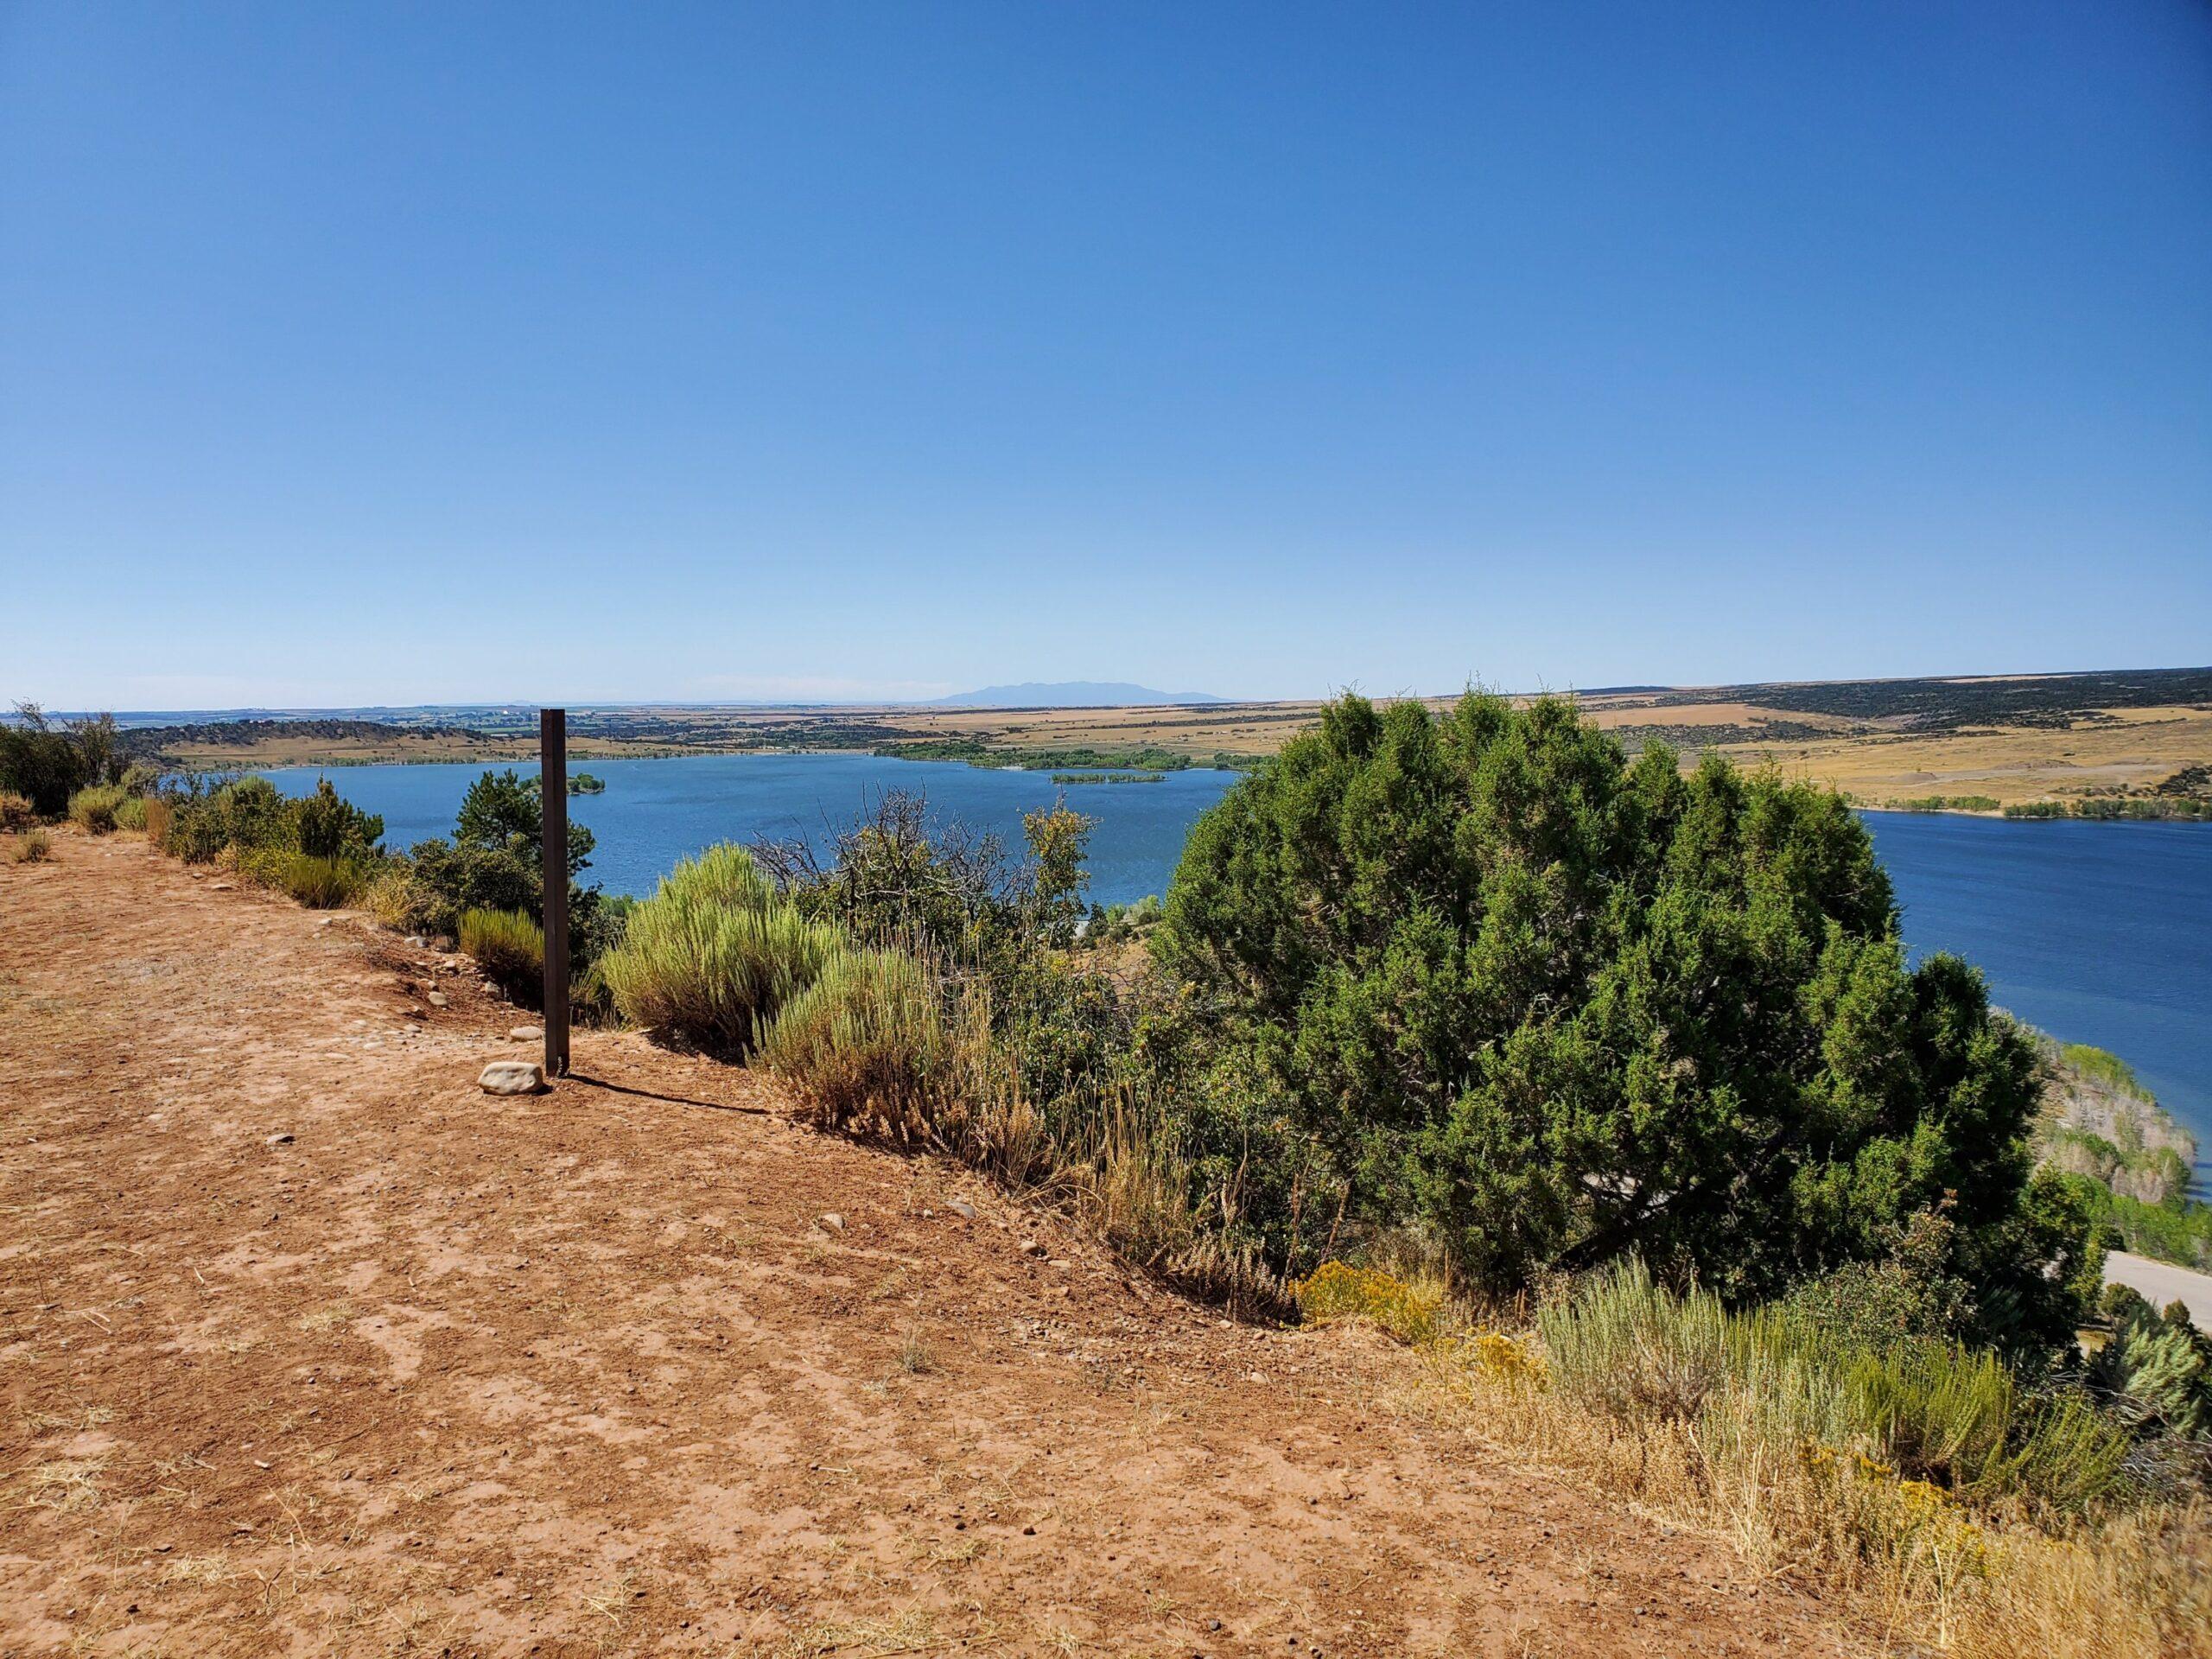 McPhee Reservoir, Delores CO